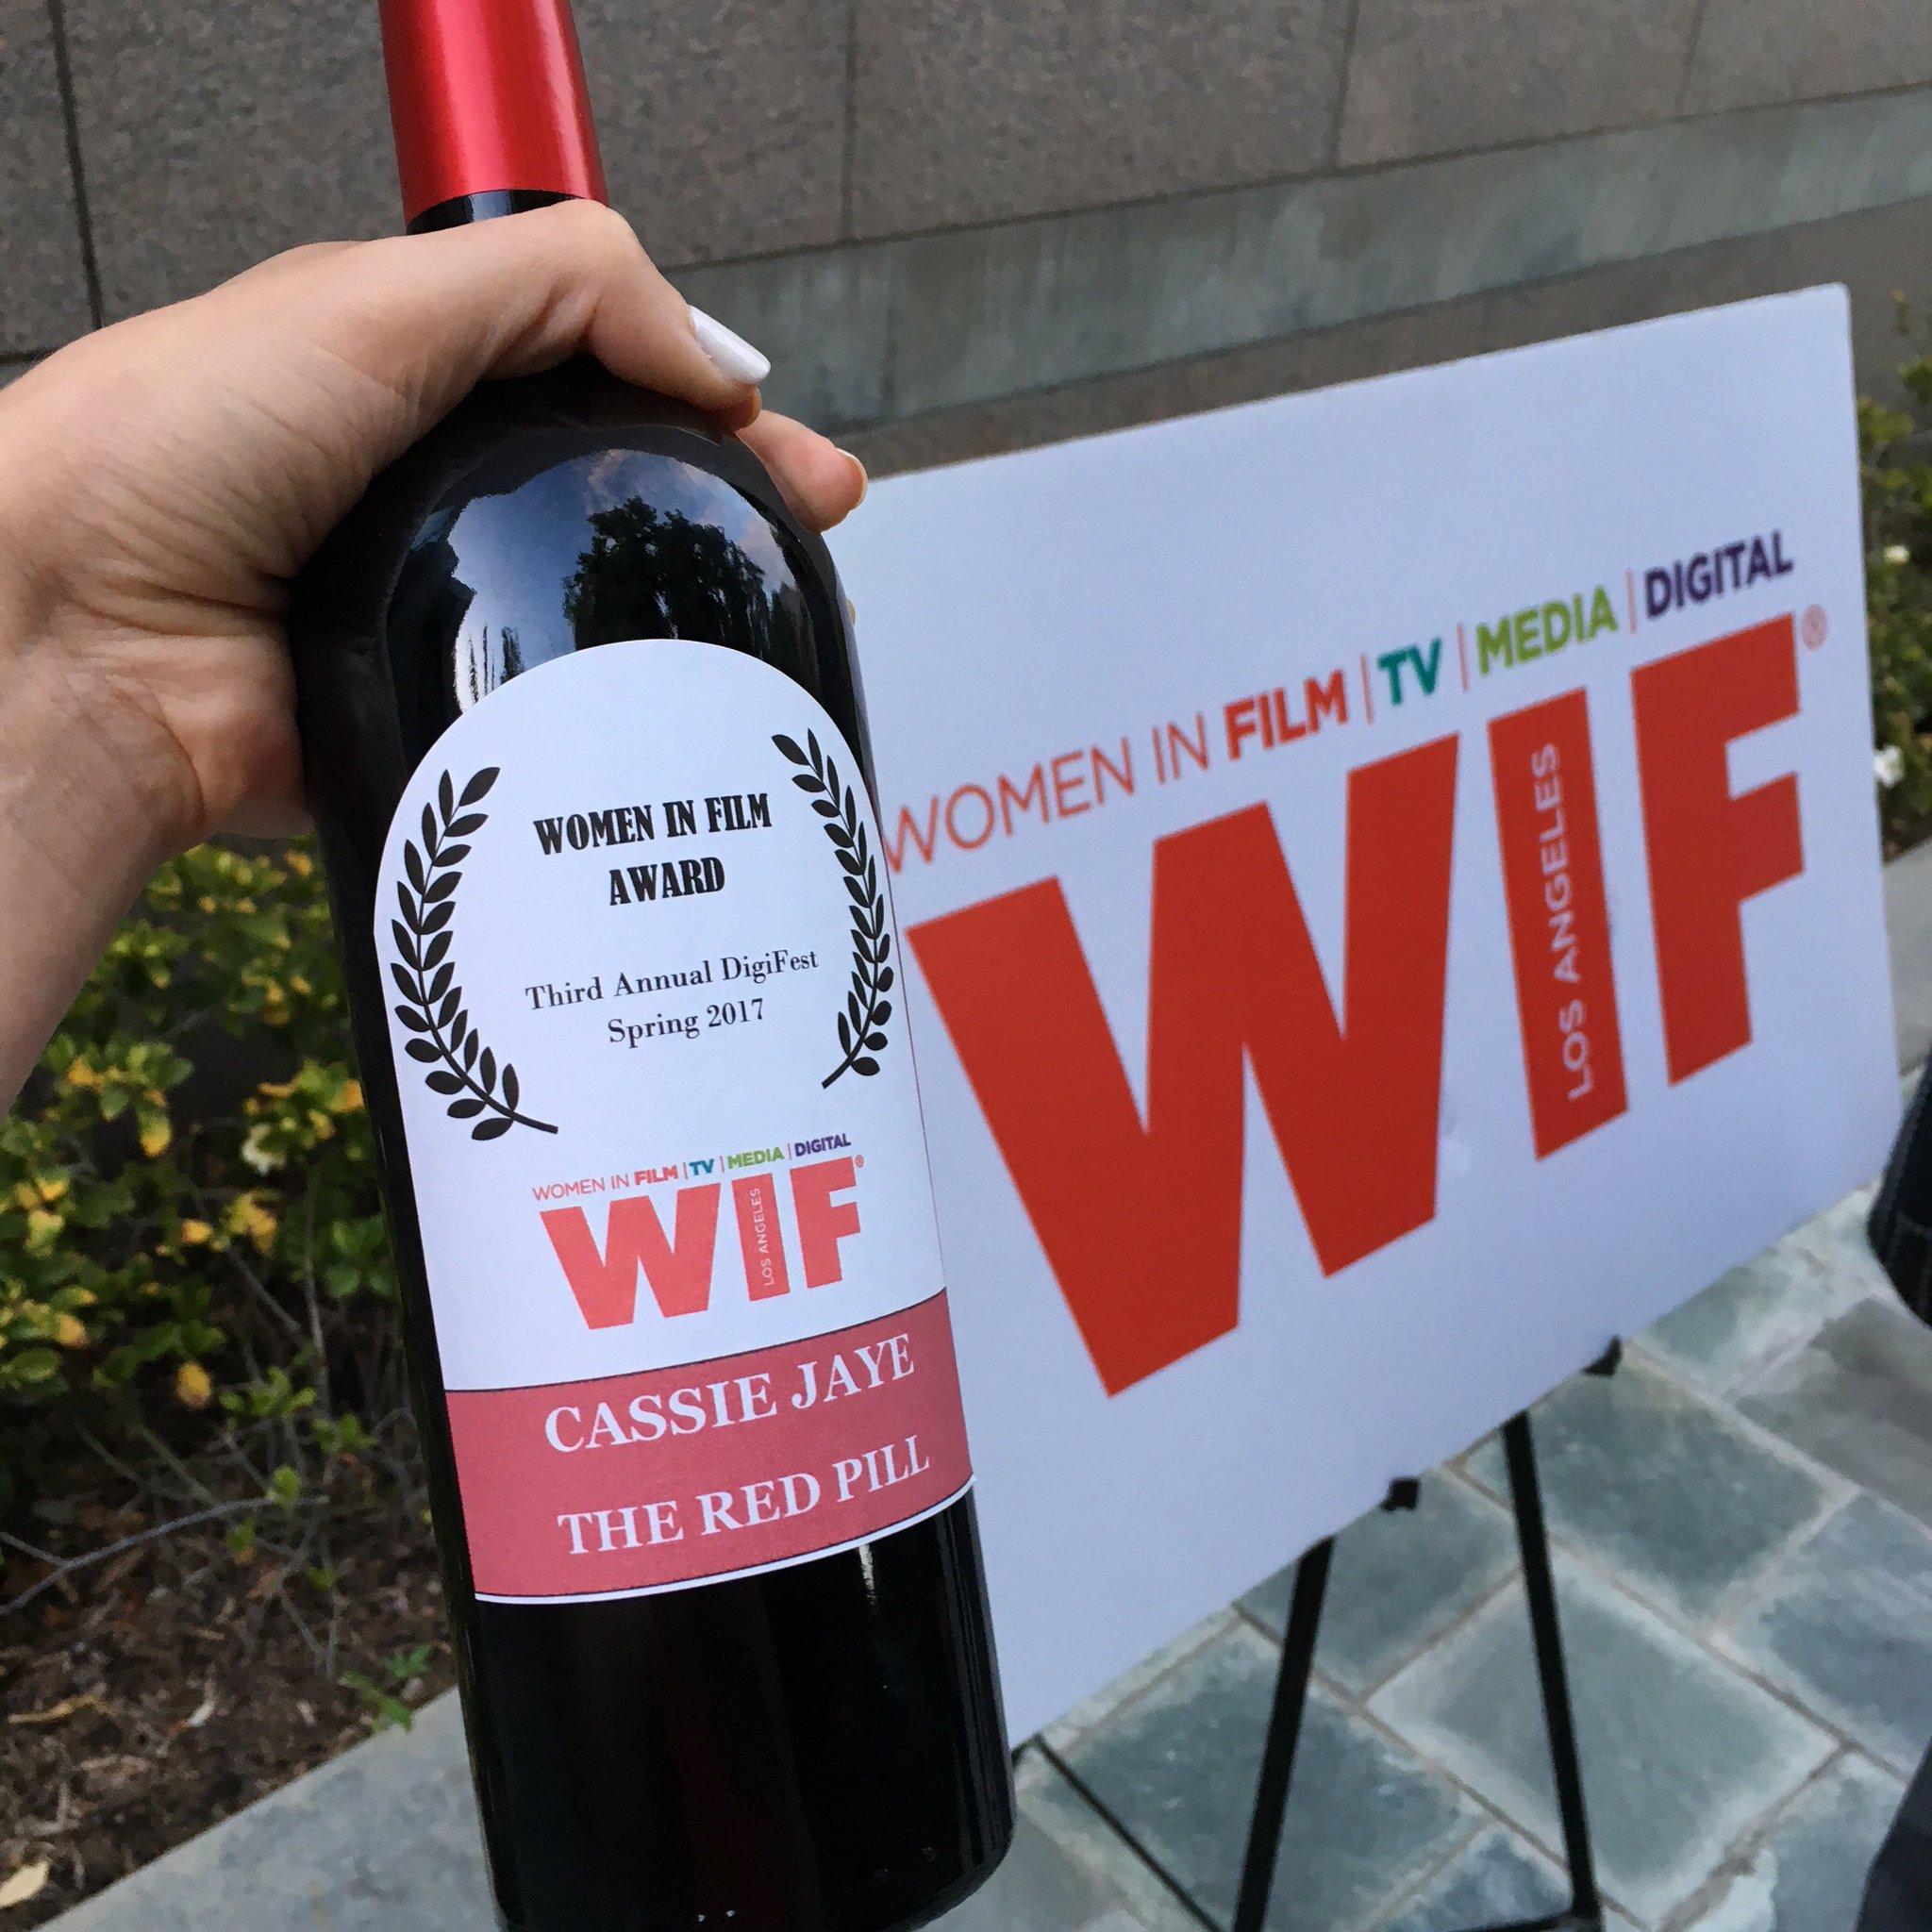 #redpillmovie just won the DigiFest Women in Film Award!!! #digitalhollywood #digifest #womeninfilm https://t.co/ek5eRDeDcN